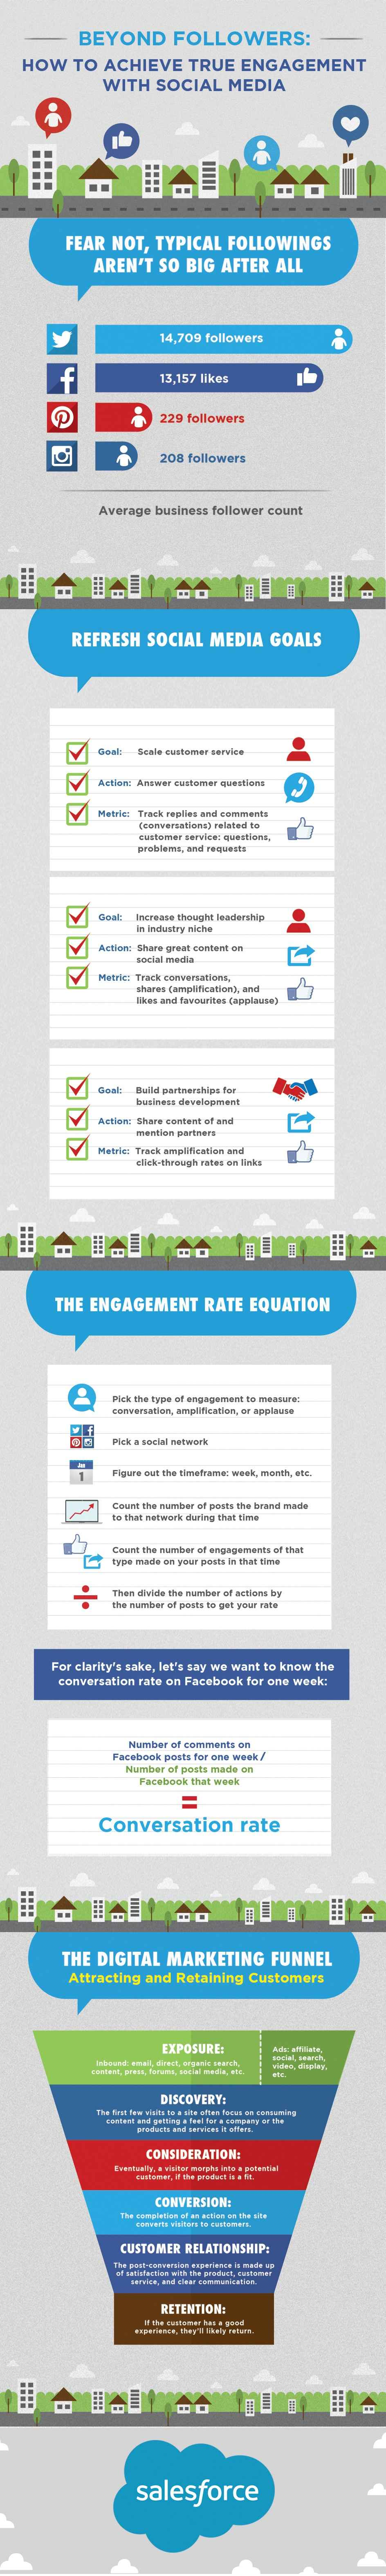 true-engagement-1